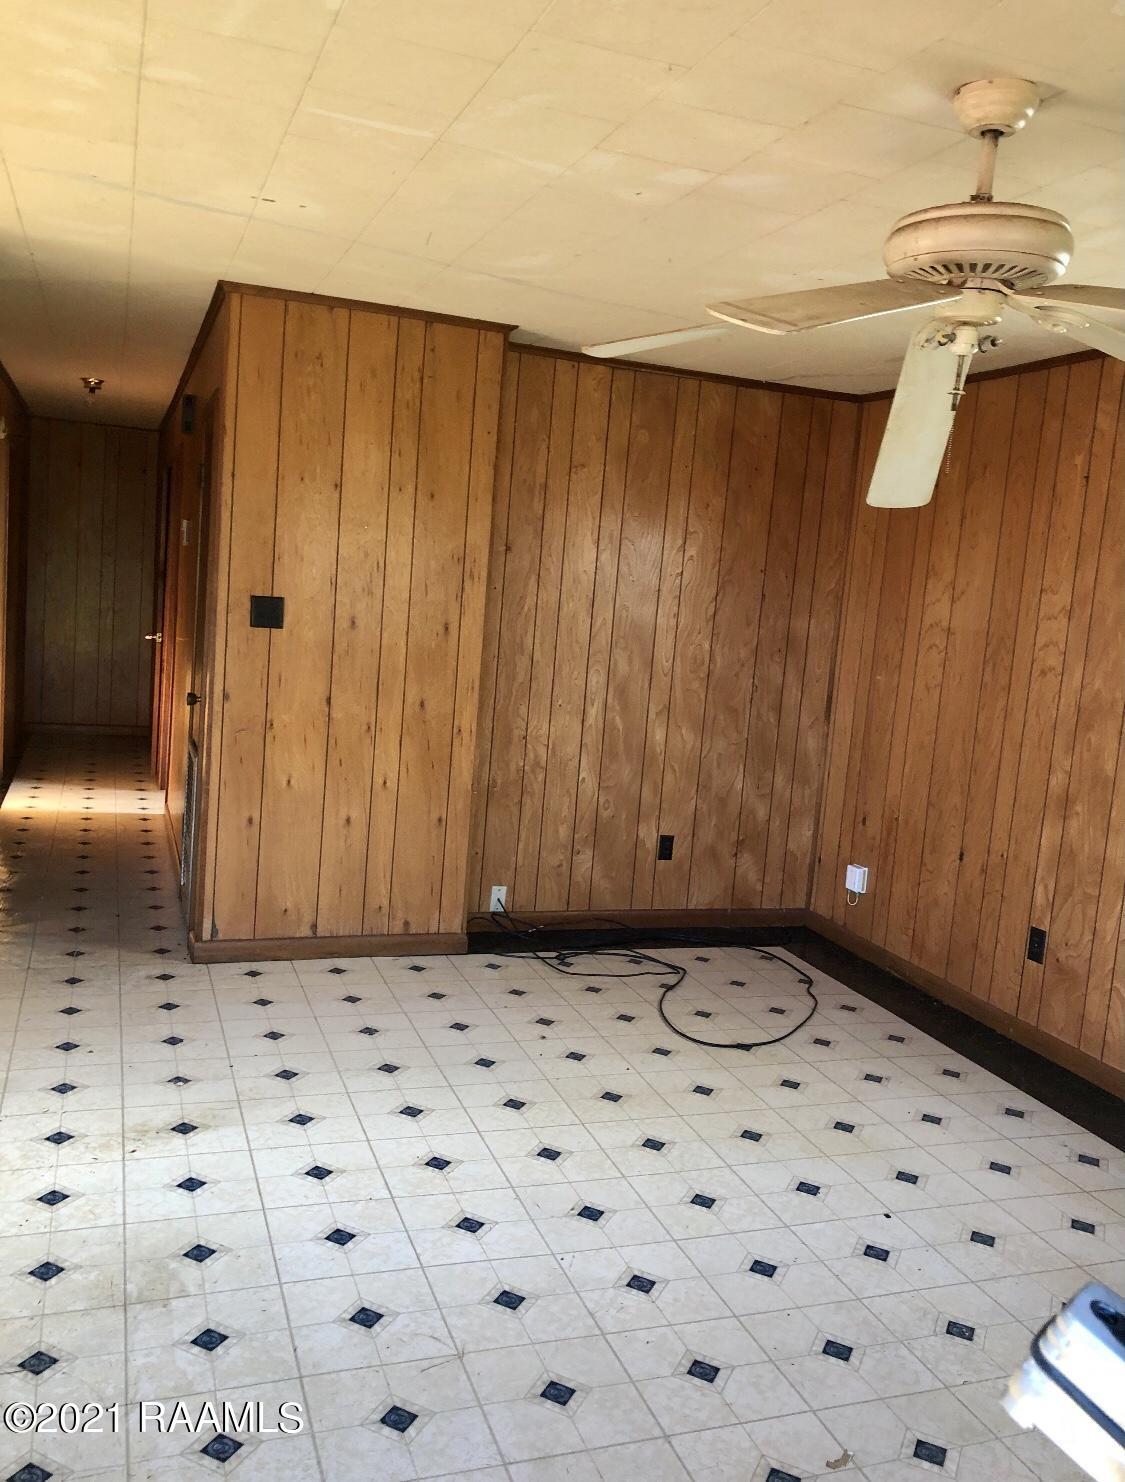 103 Linares Street, Carencro, LA 70520 Photo #6